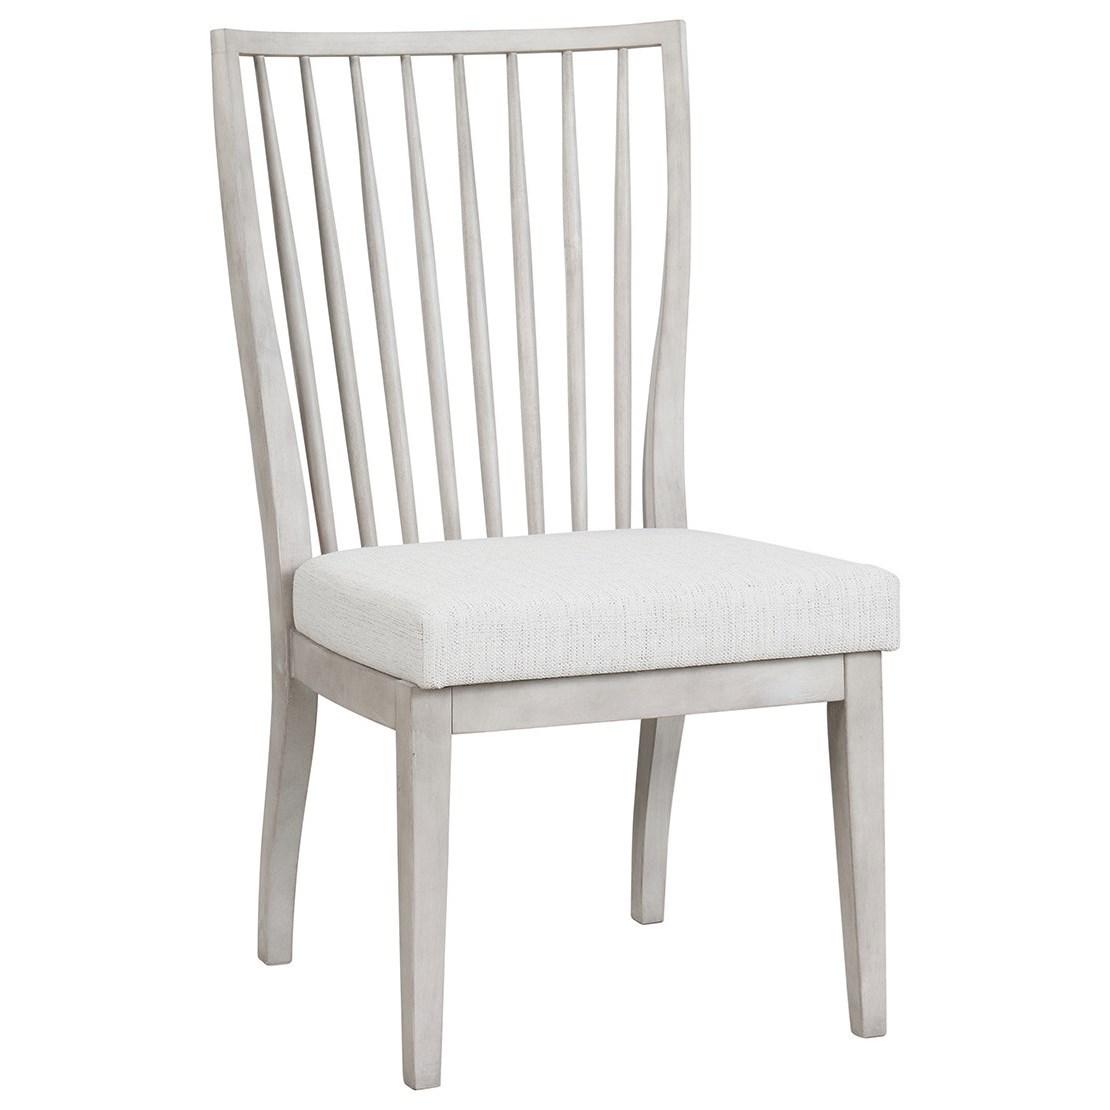 Modern Farmhouse Bowen Side Chair by Universal at Baer's Furniture